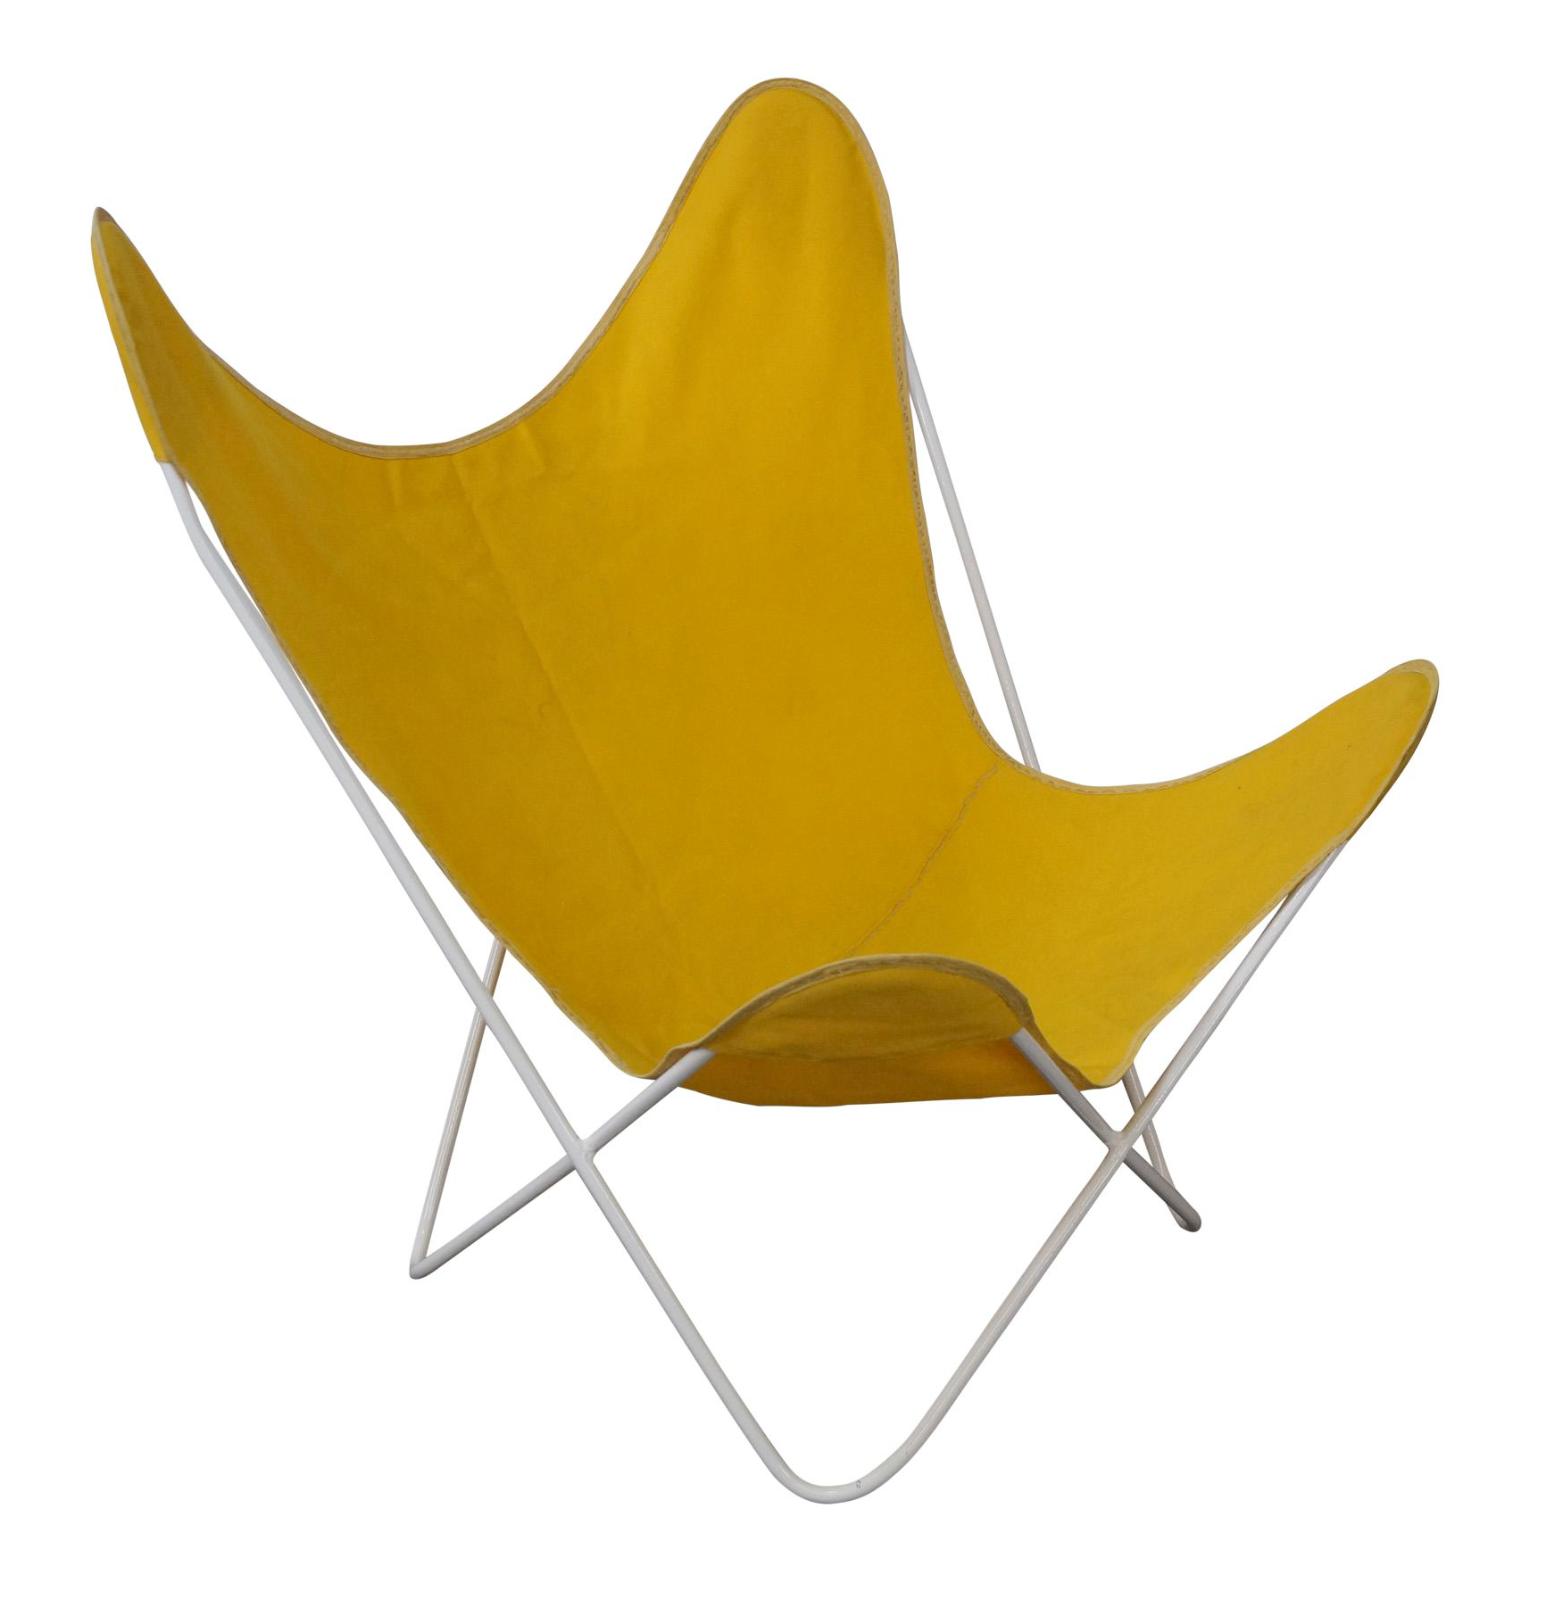 Delightful Knoll Hardoy Mid Century Modern Iron Frame Butterfly Chair